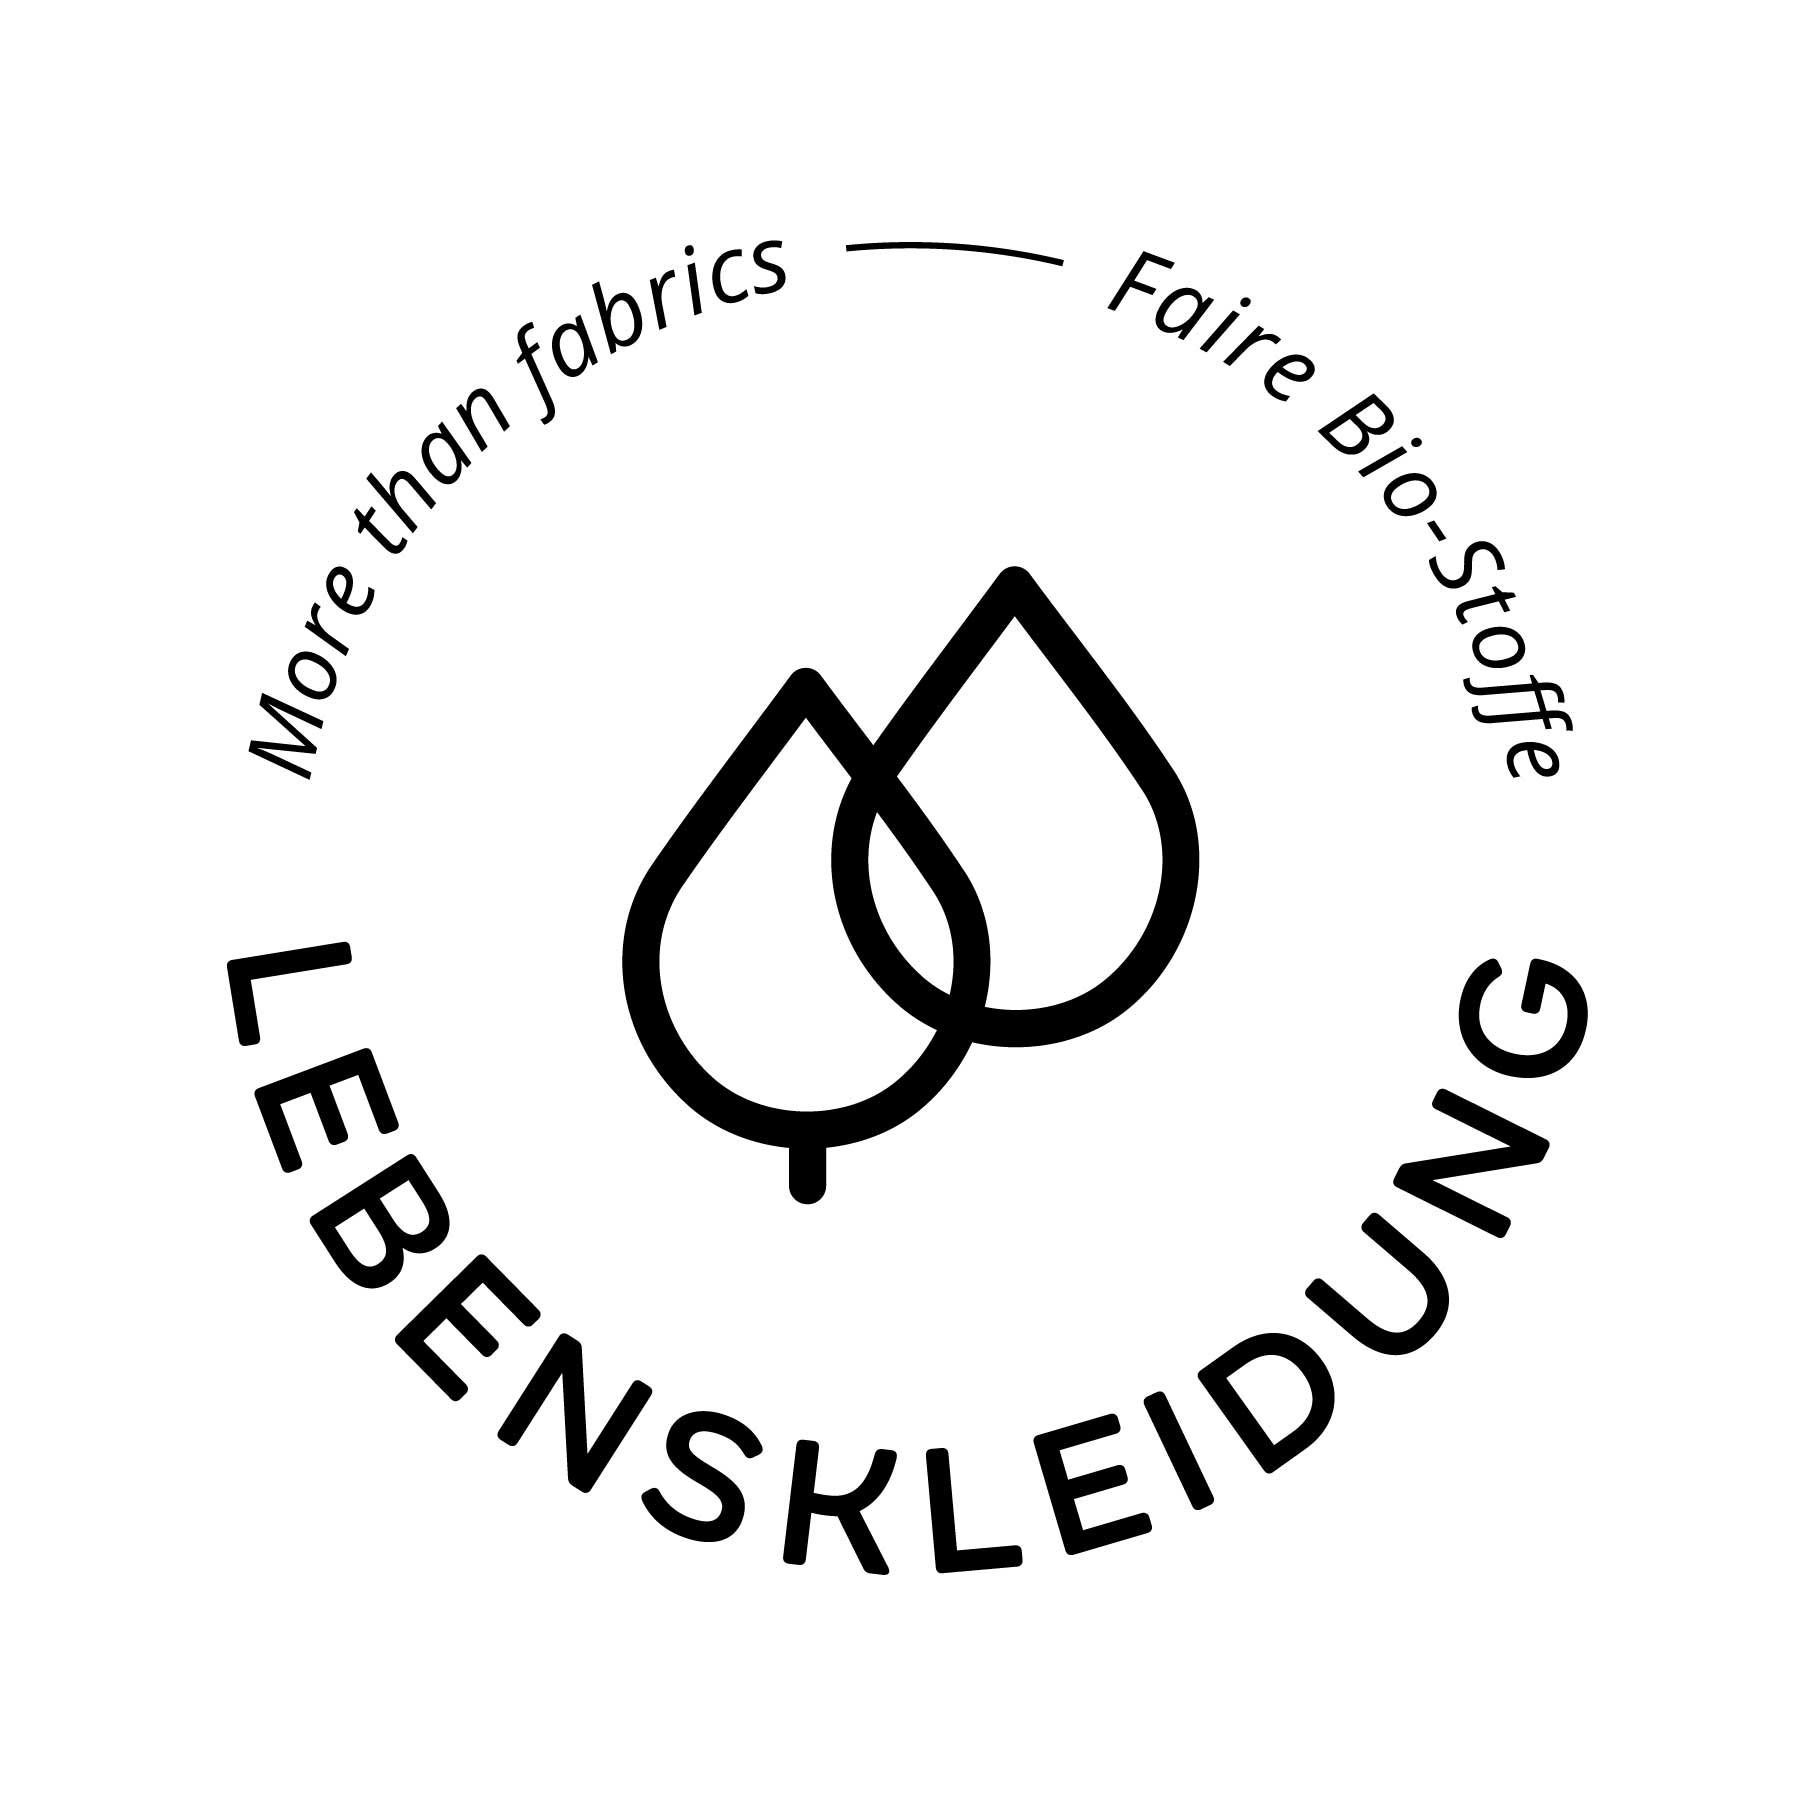 Bio Tissu RIB 2x1 (manchette) - noir